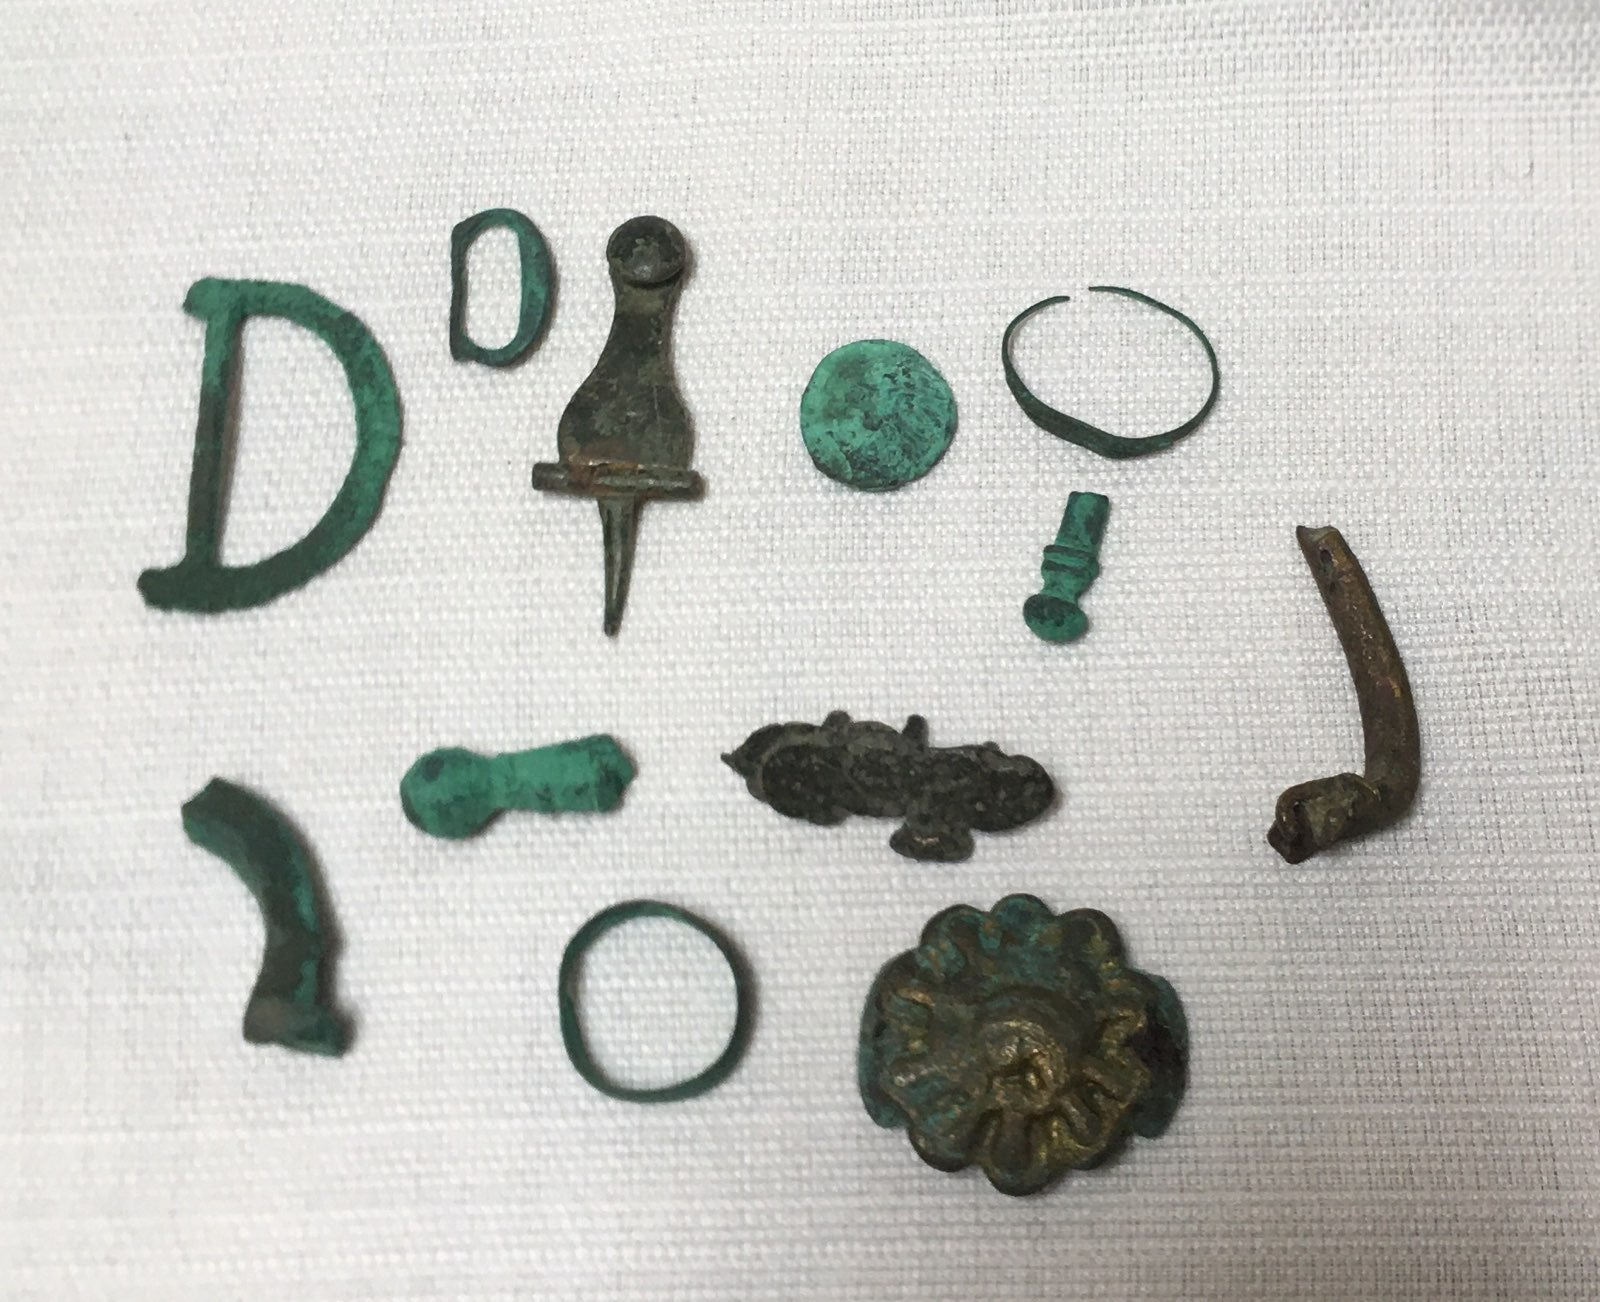 12 Ancient Relics & Tokens